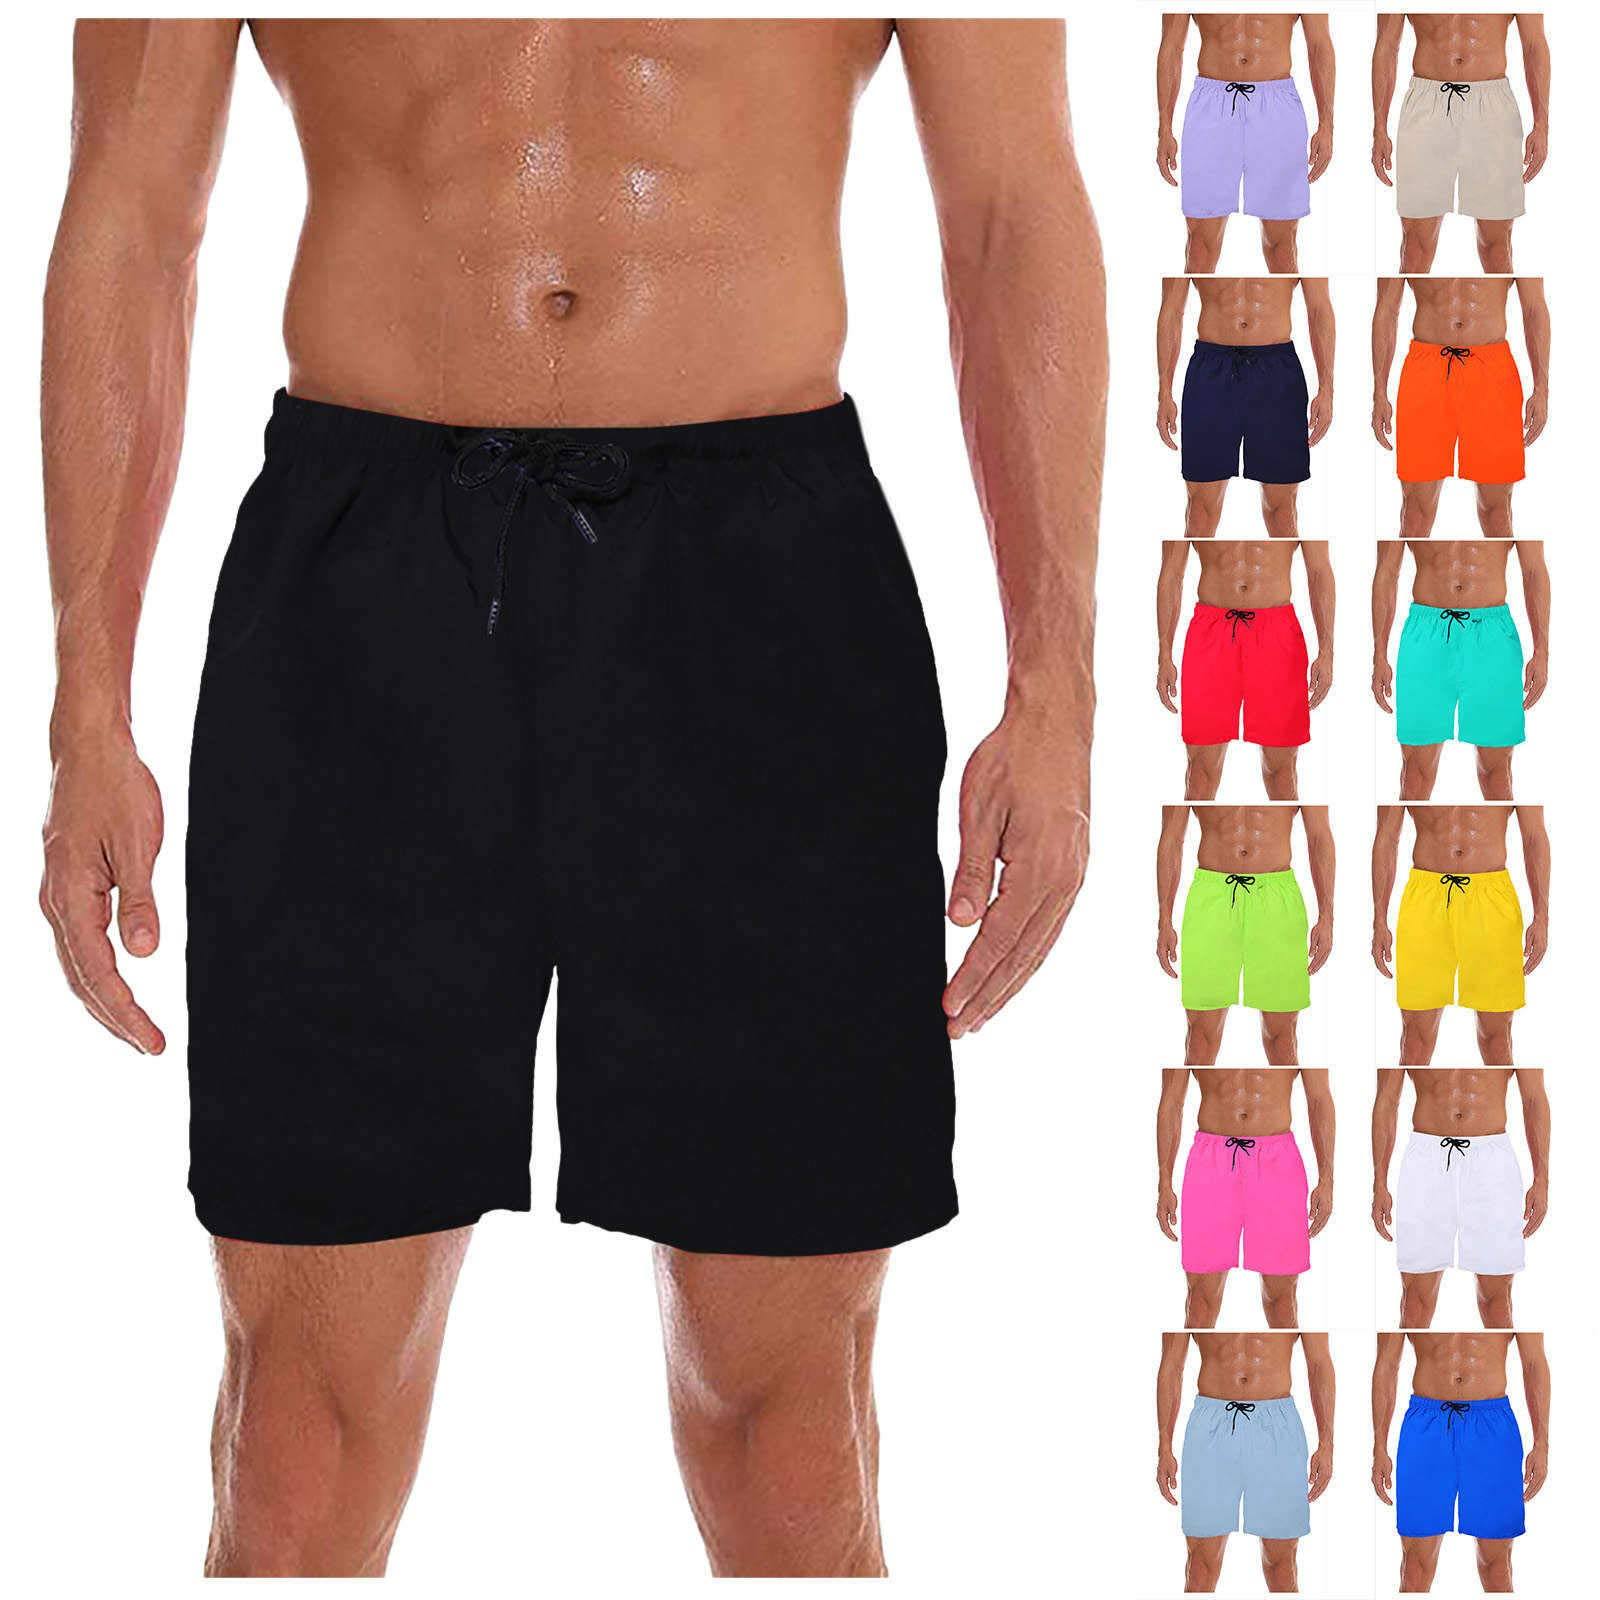 2DXuixsh Mens Quick Dry Swim Shorts Swim Trunks Drawstring Elastic Waist Bathing